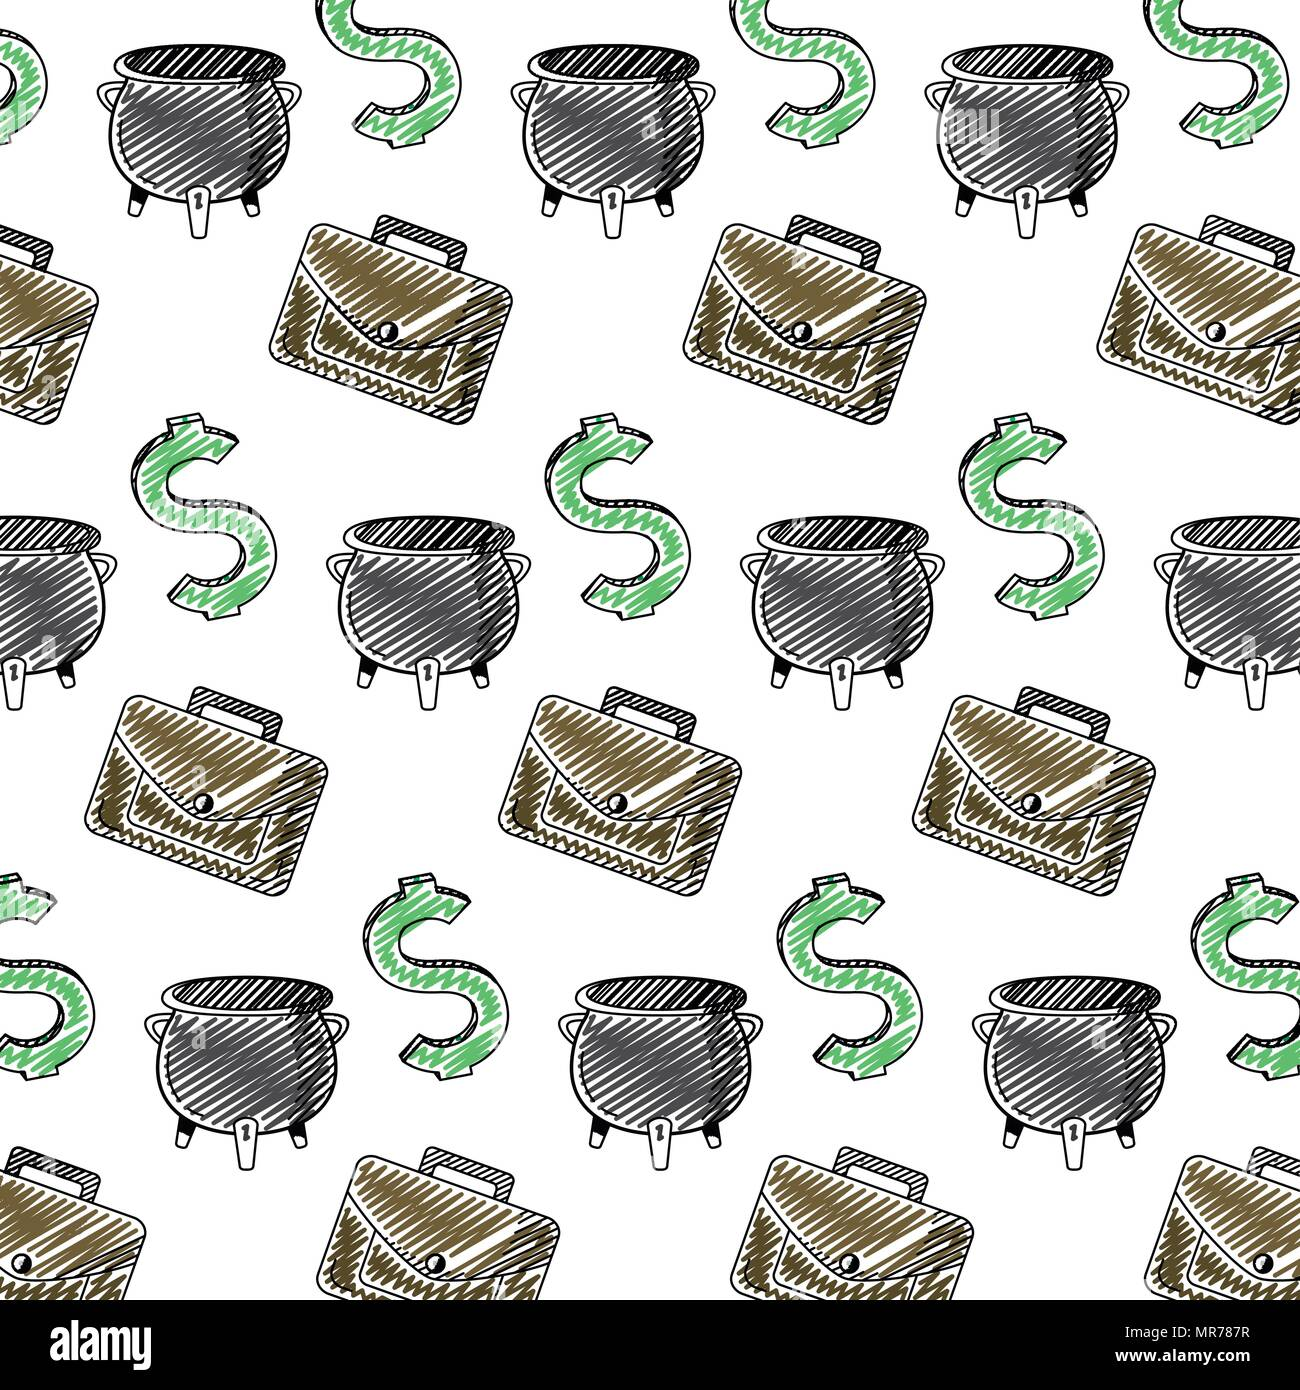 doodle finance cash money things background - Stock Image